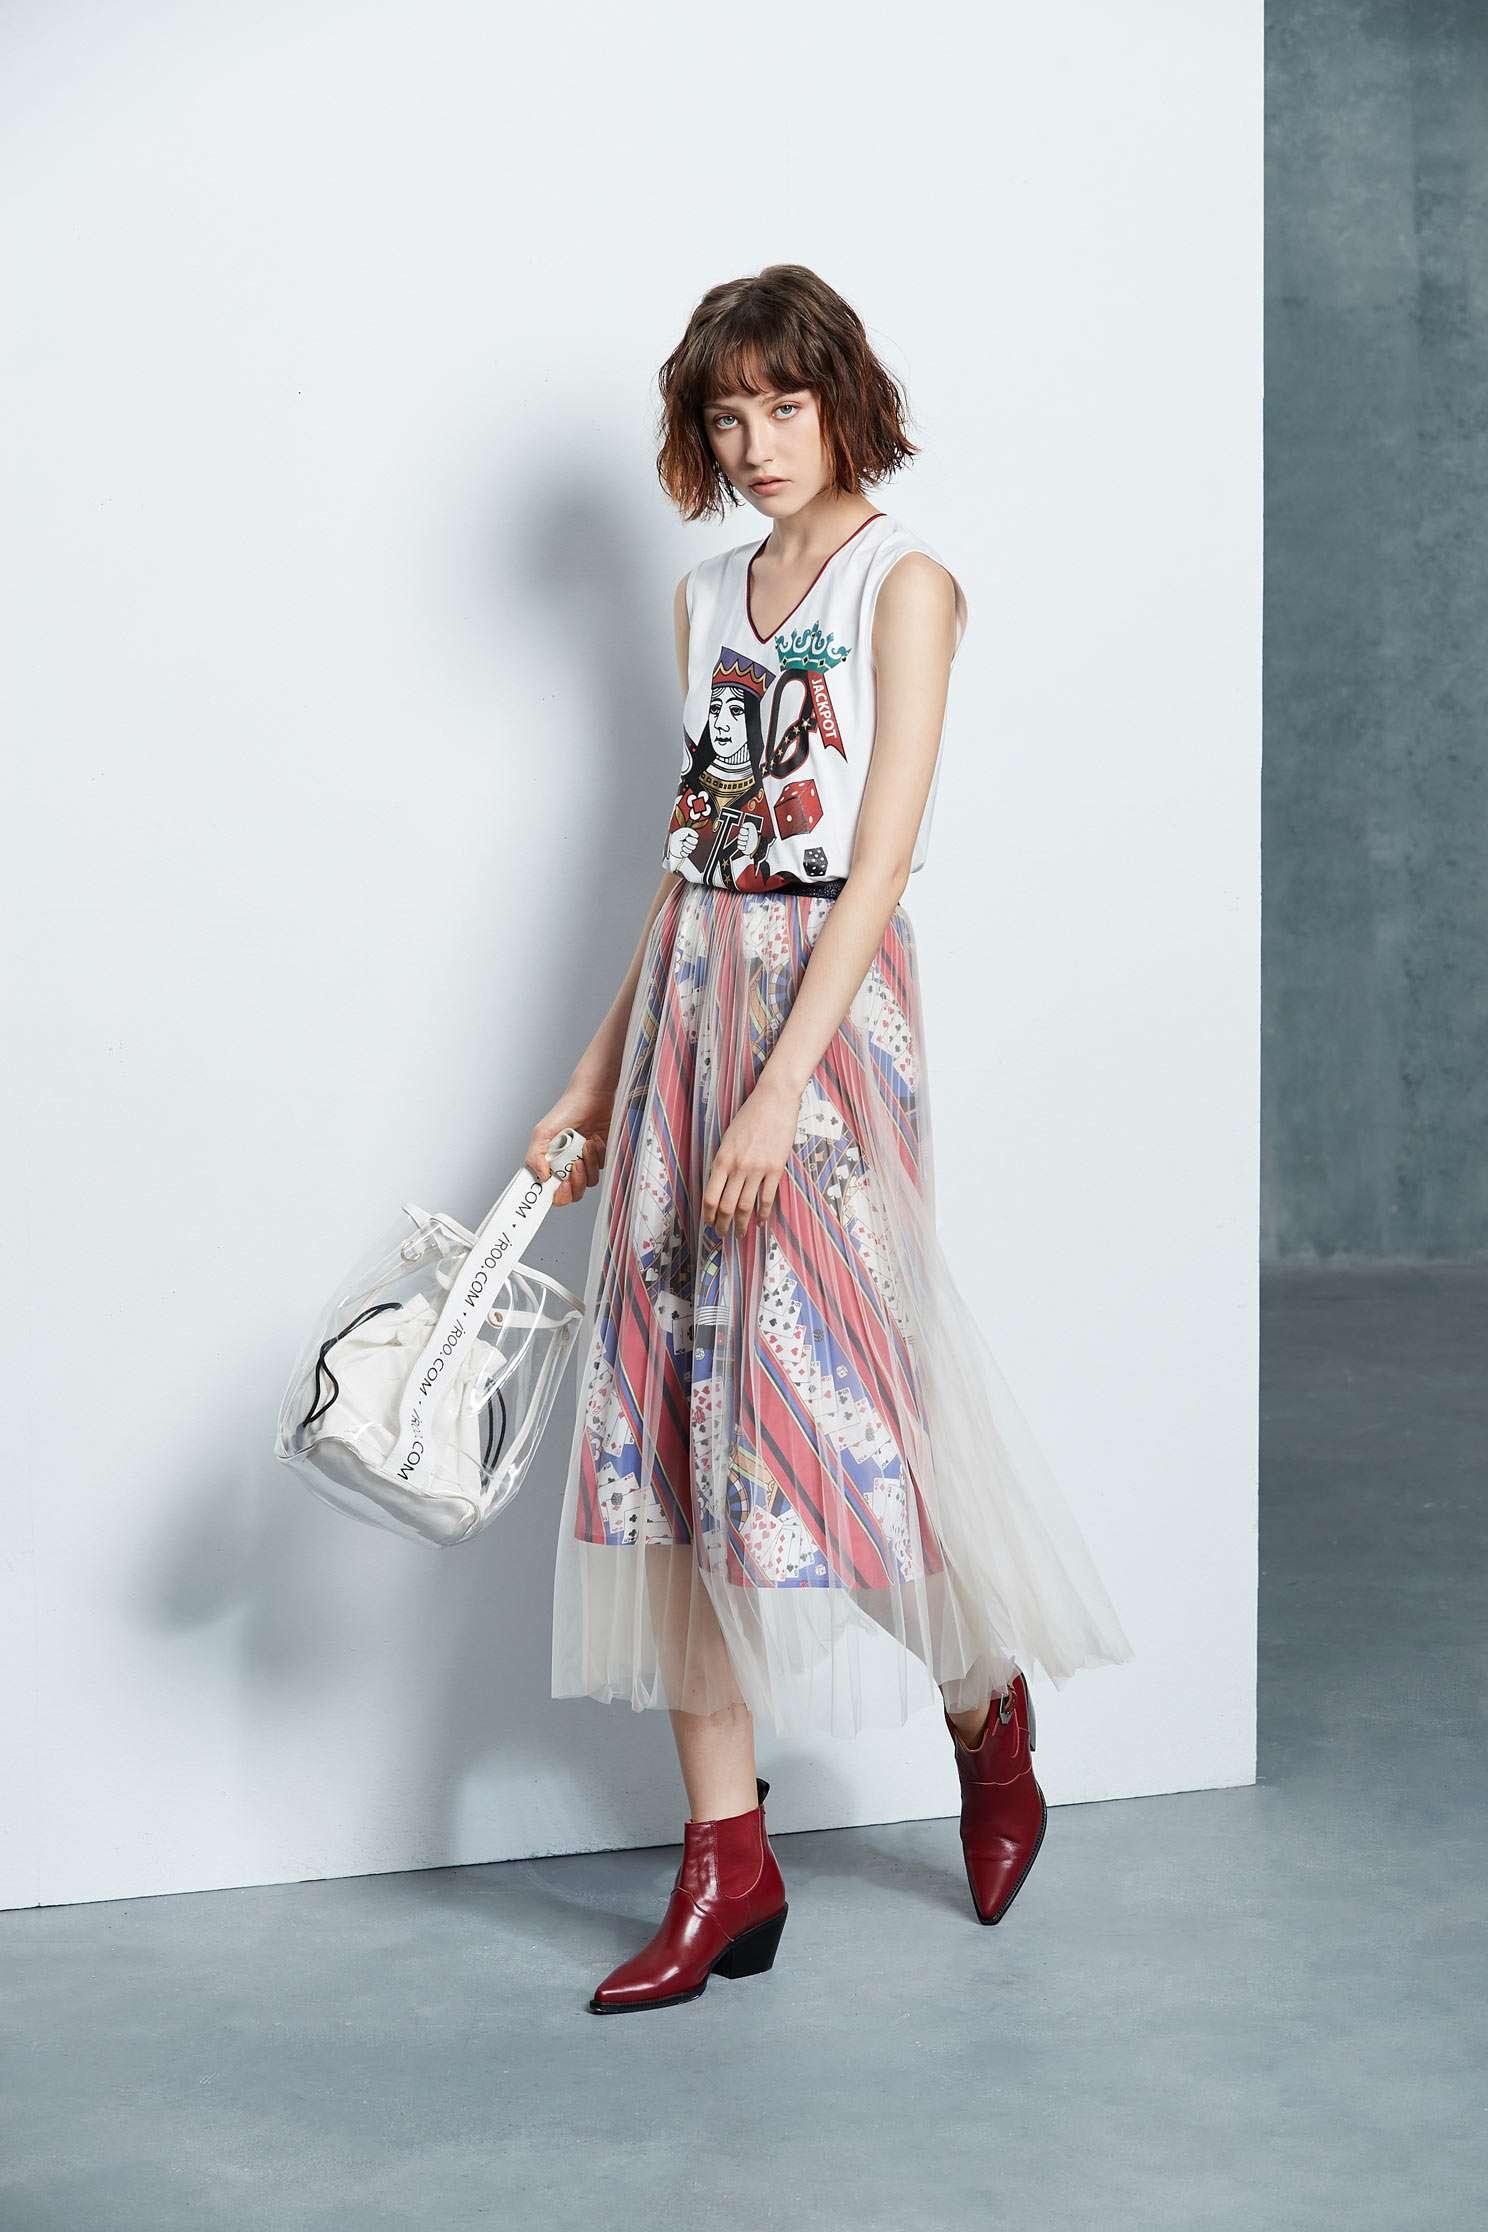 Poker Queen Fashion Vest